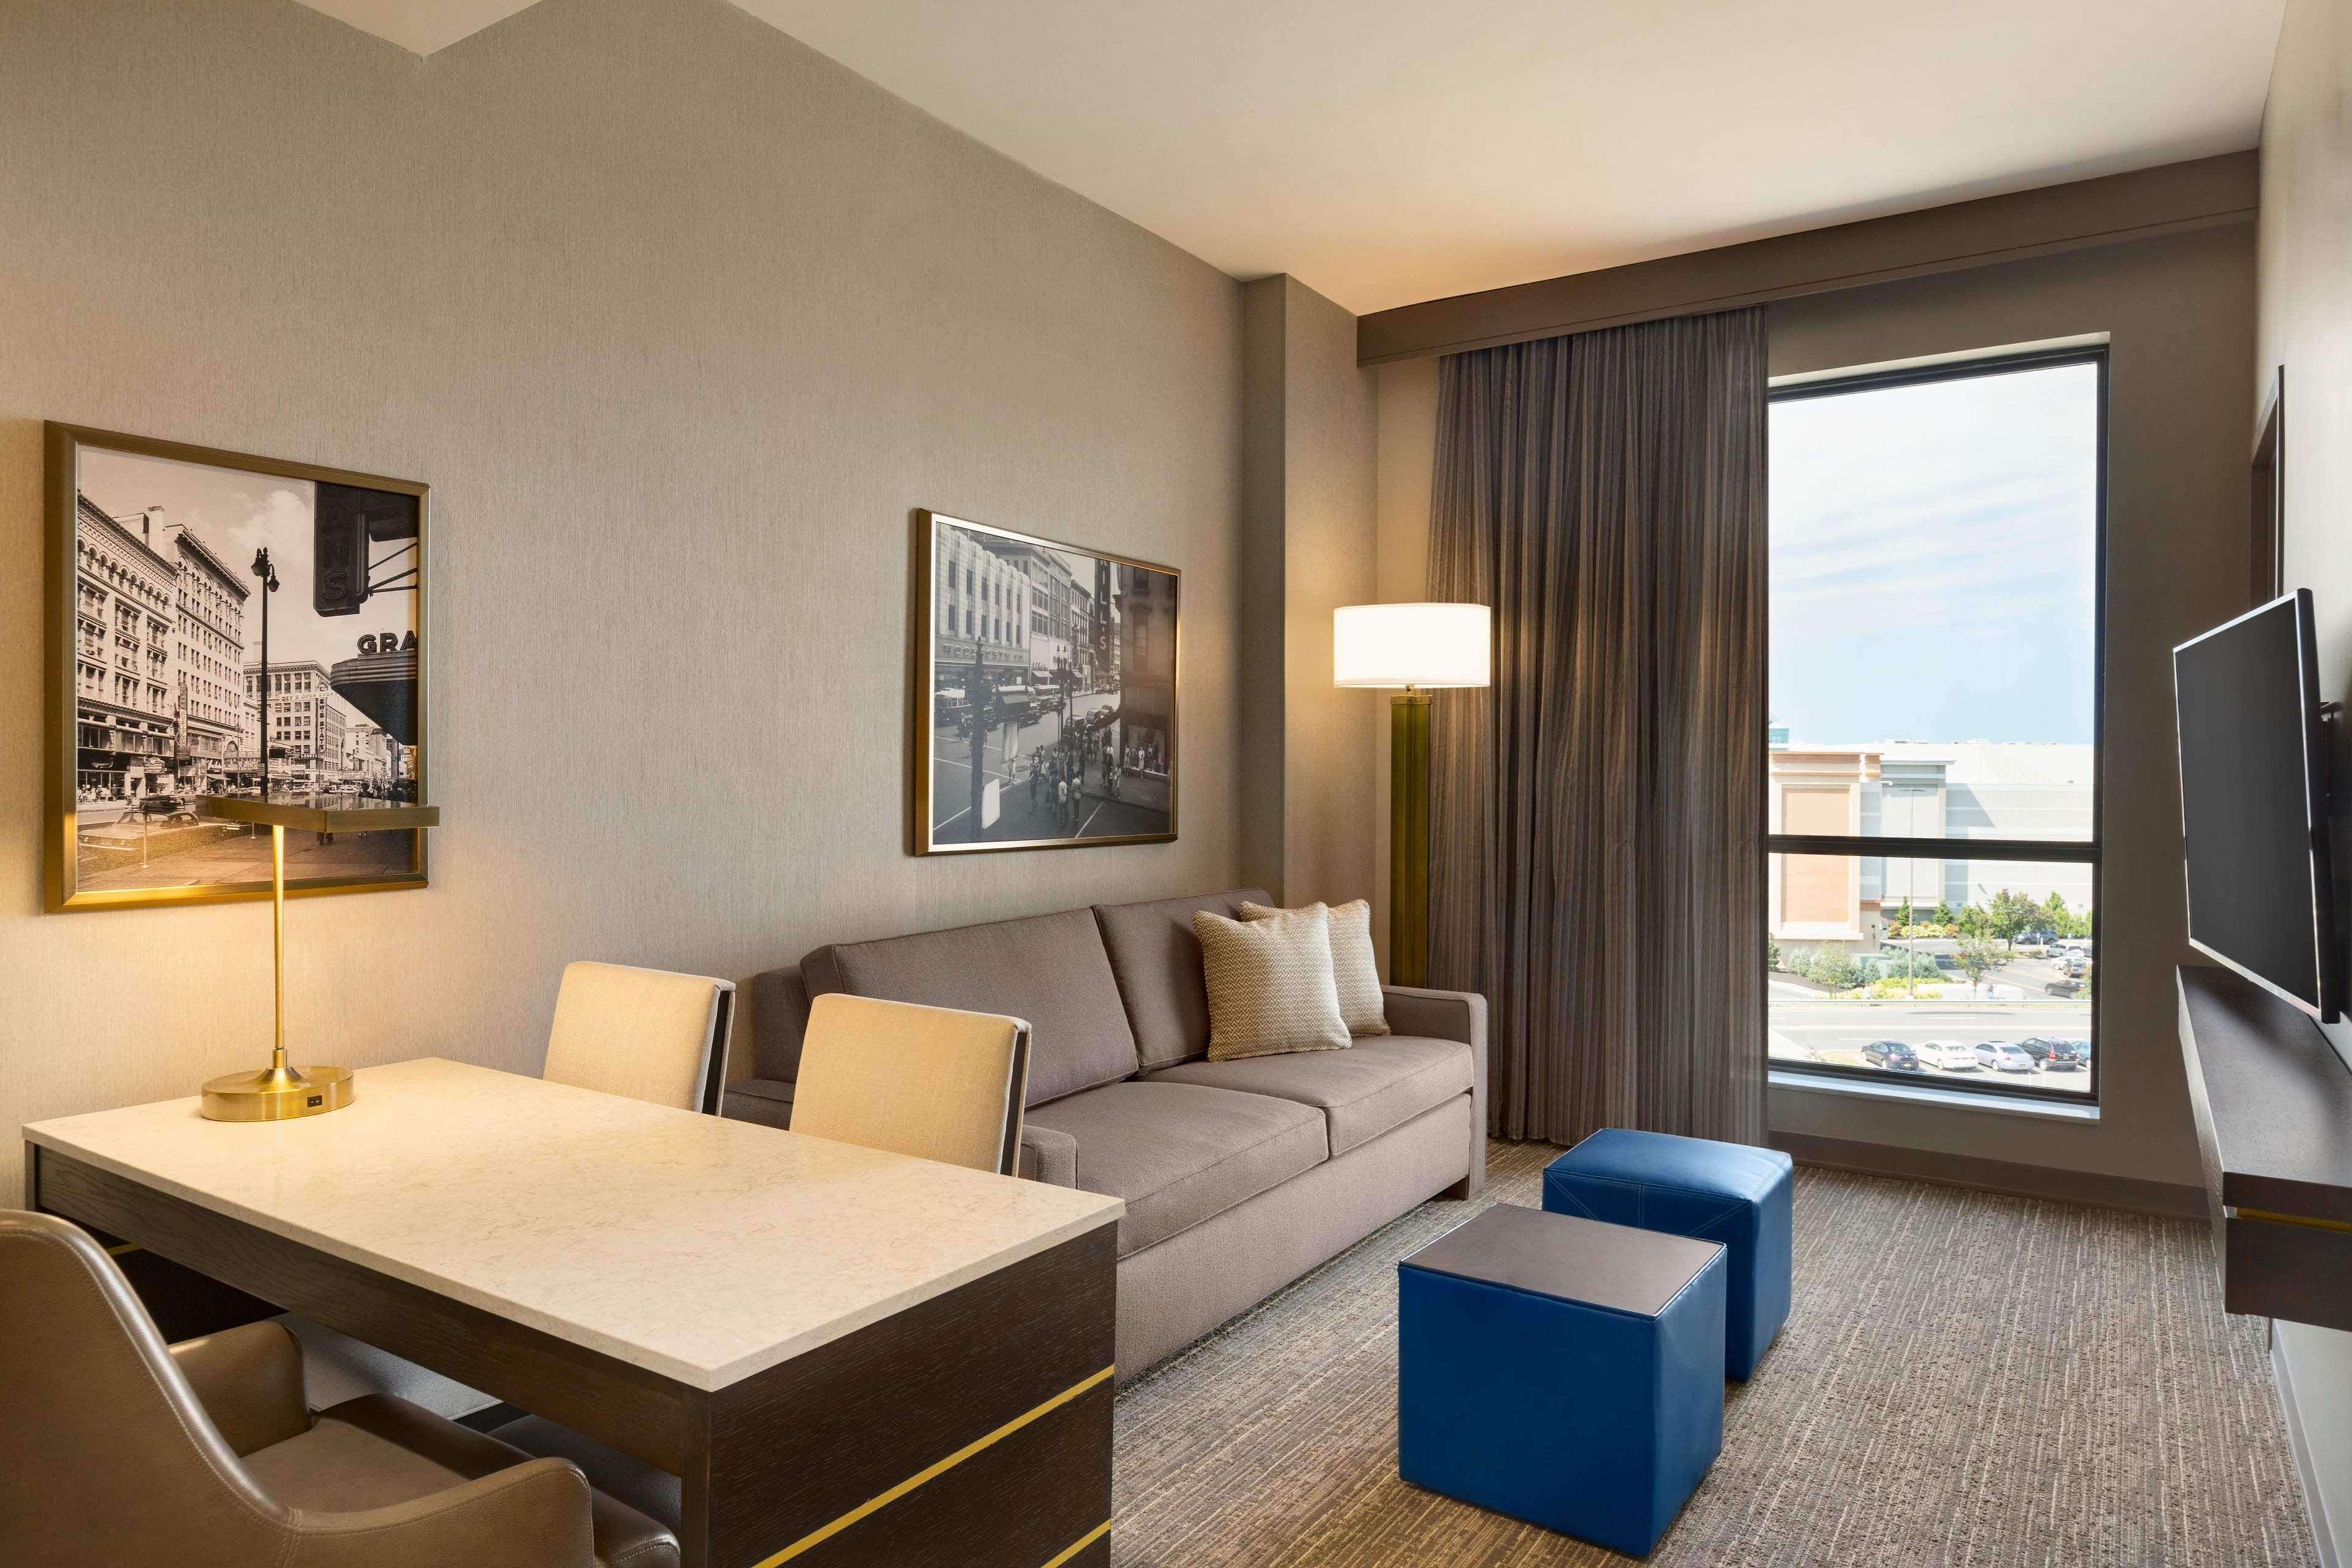 Embassy Suites by Hilton Syracuse Destiny USA image 21